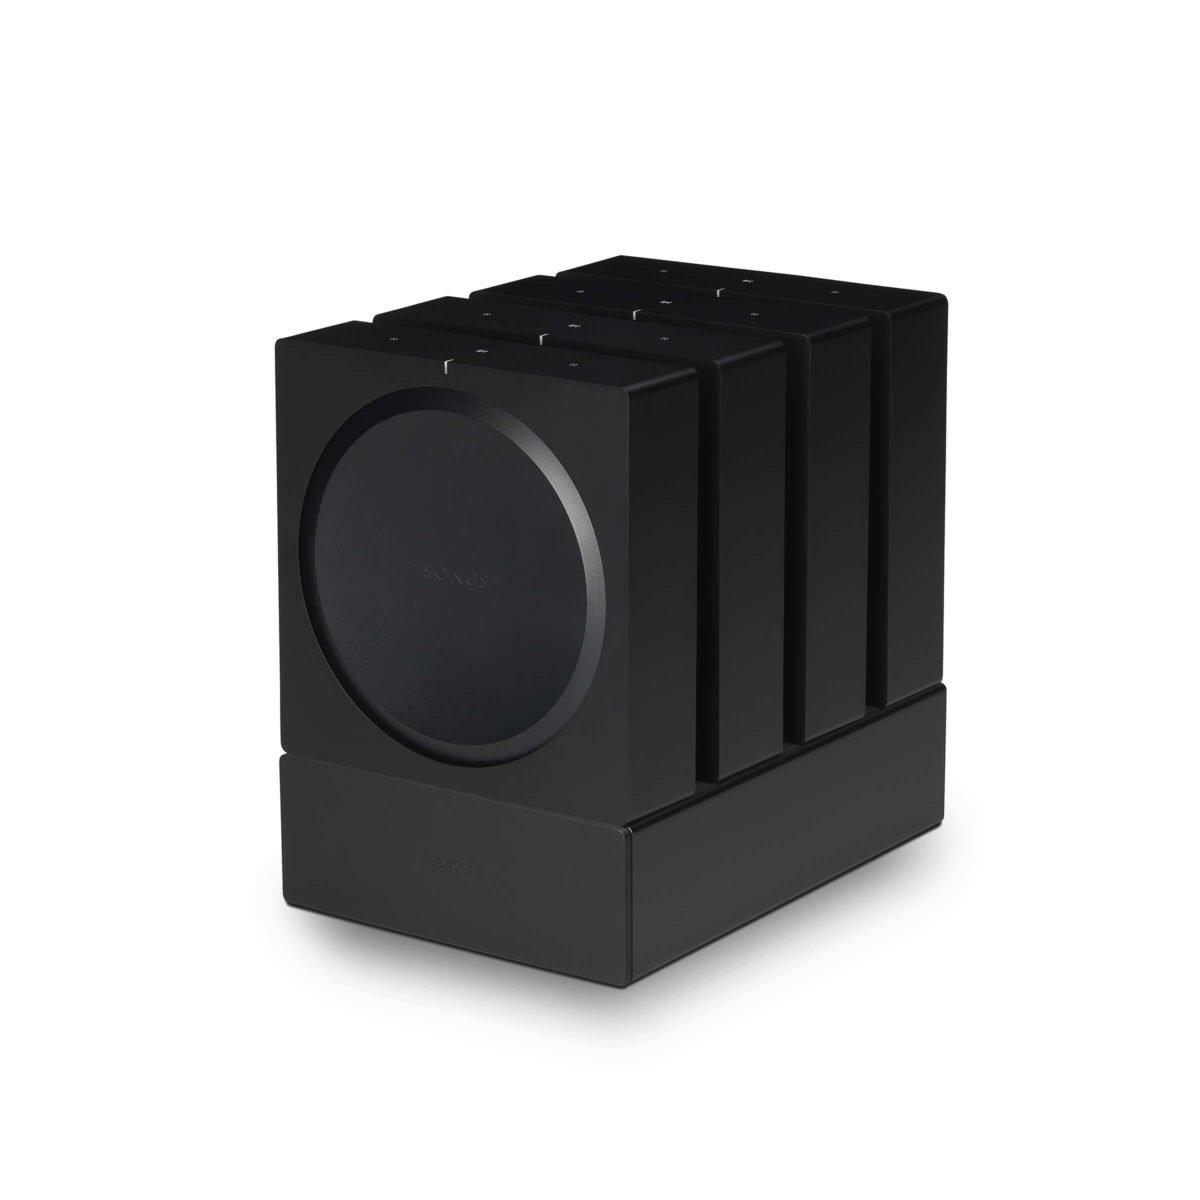 Flexson Sonos AMP dock 6